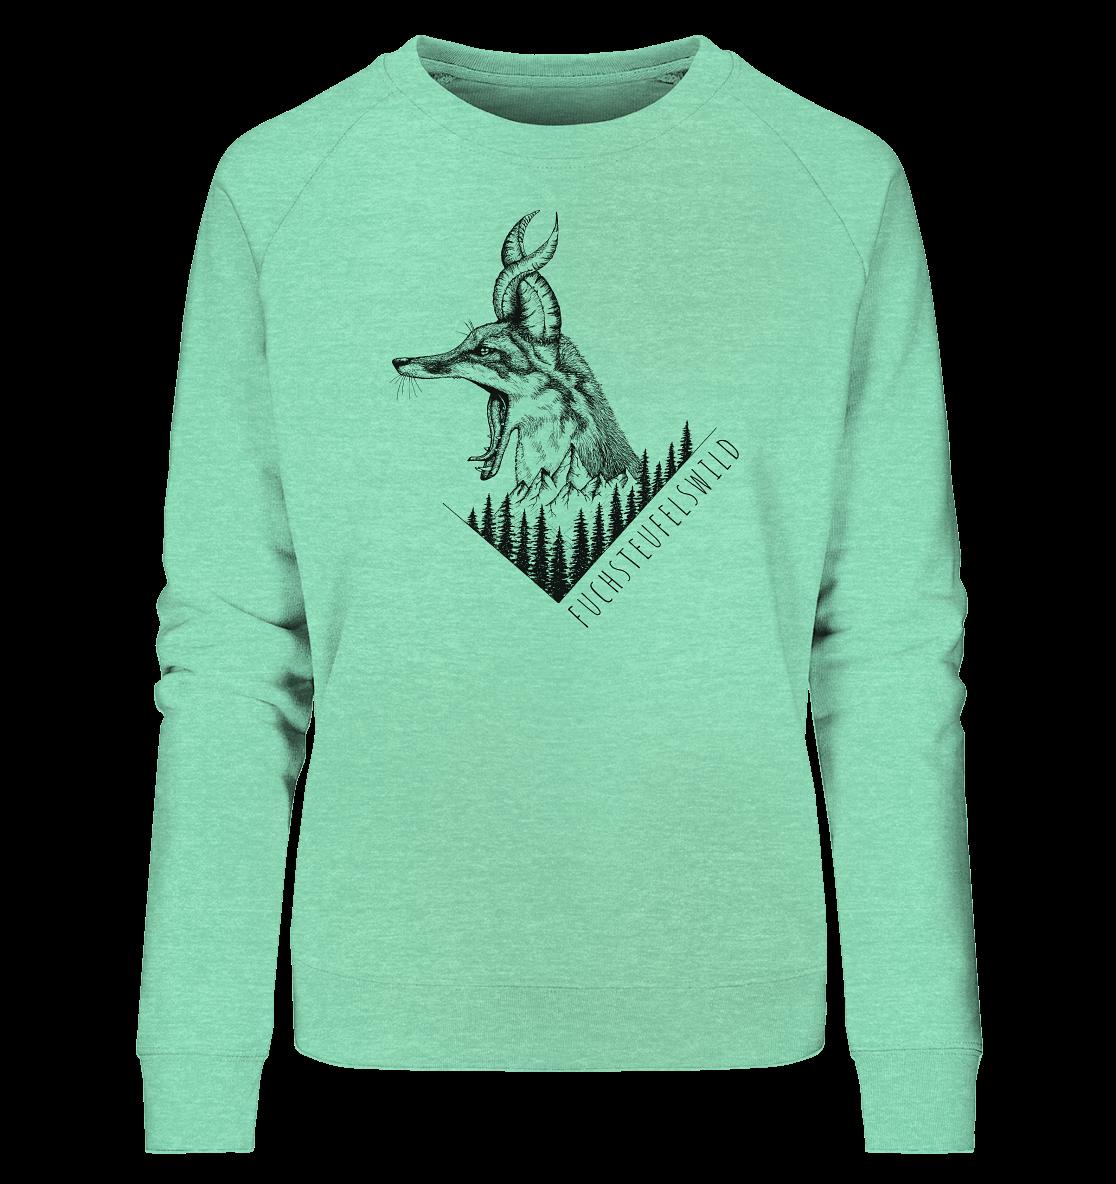 front-ladies-organic-sweatshirt-84e5bd-1116x-4.png